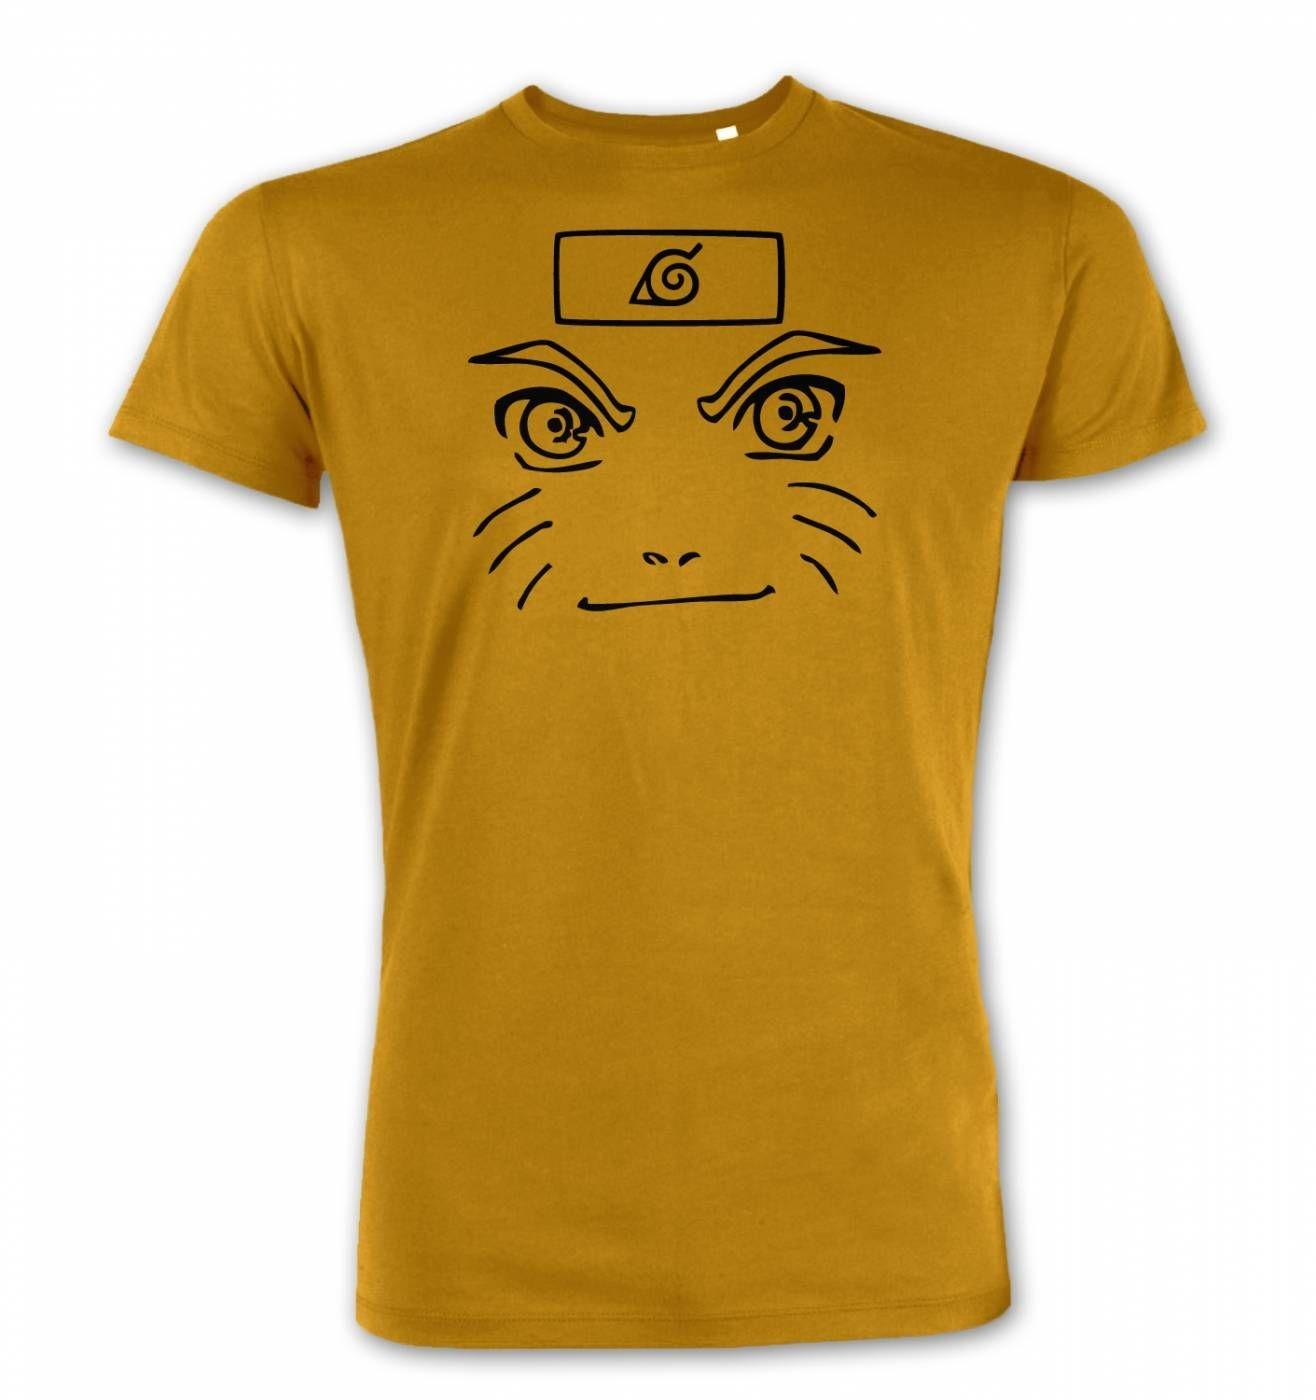 Naruto Face - Premium t-shirt